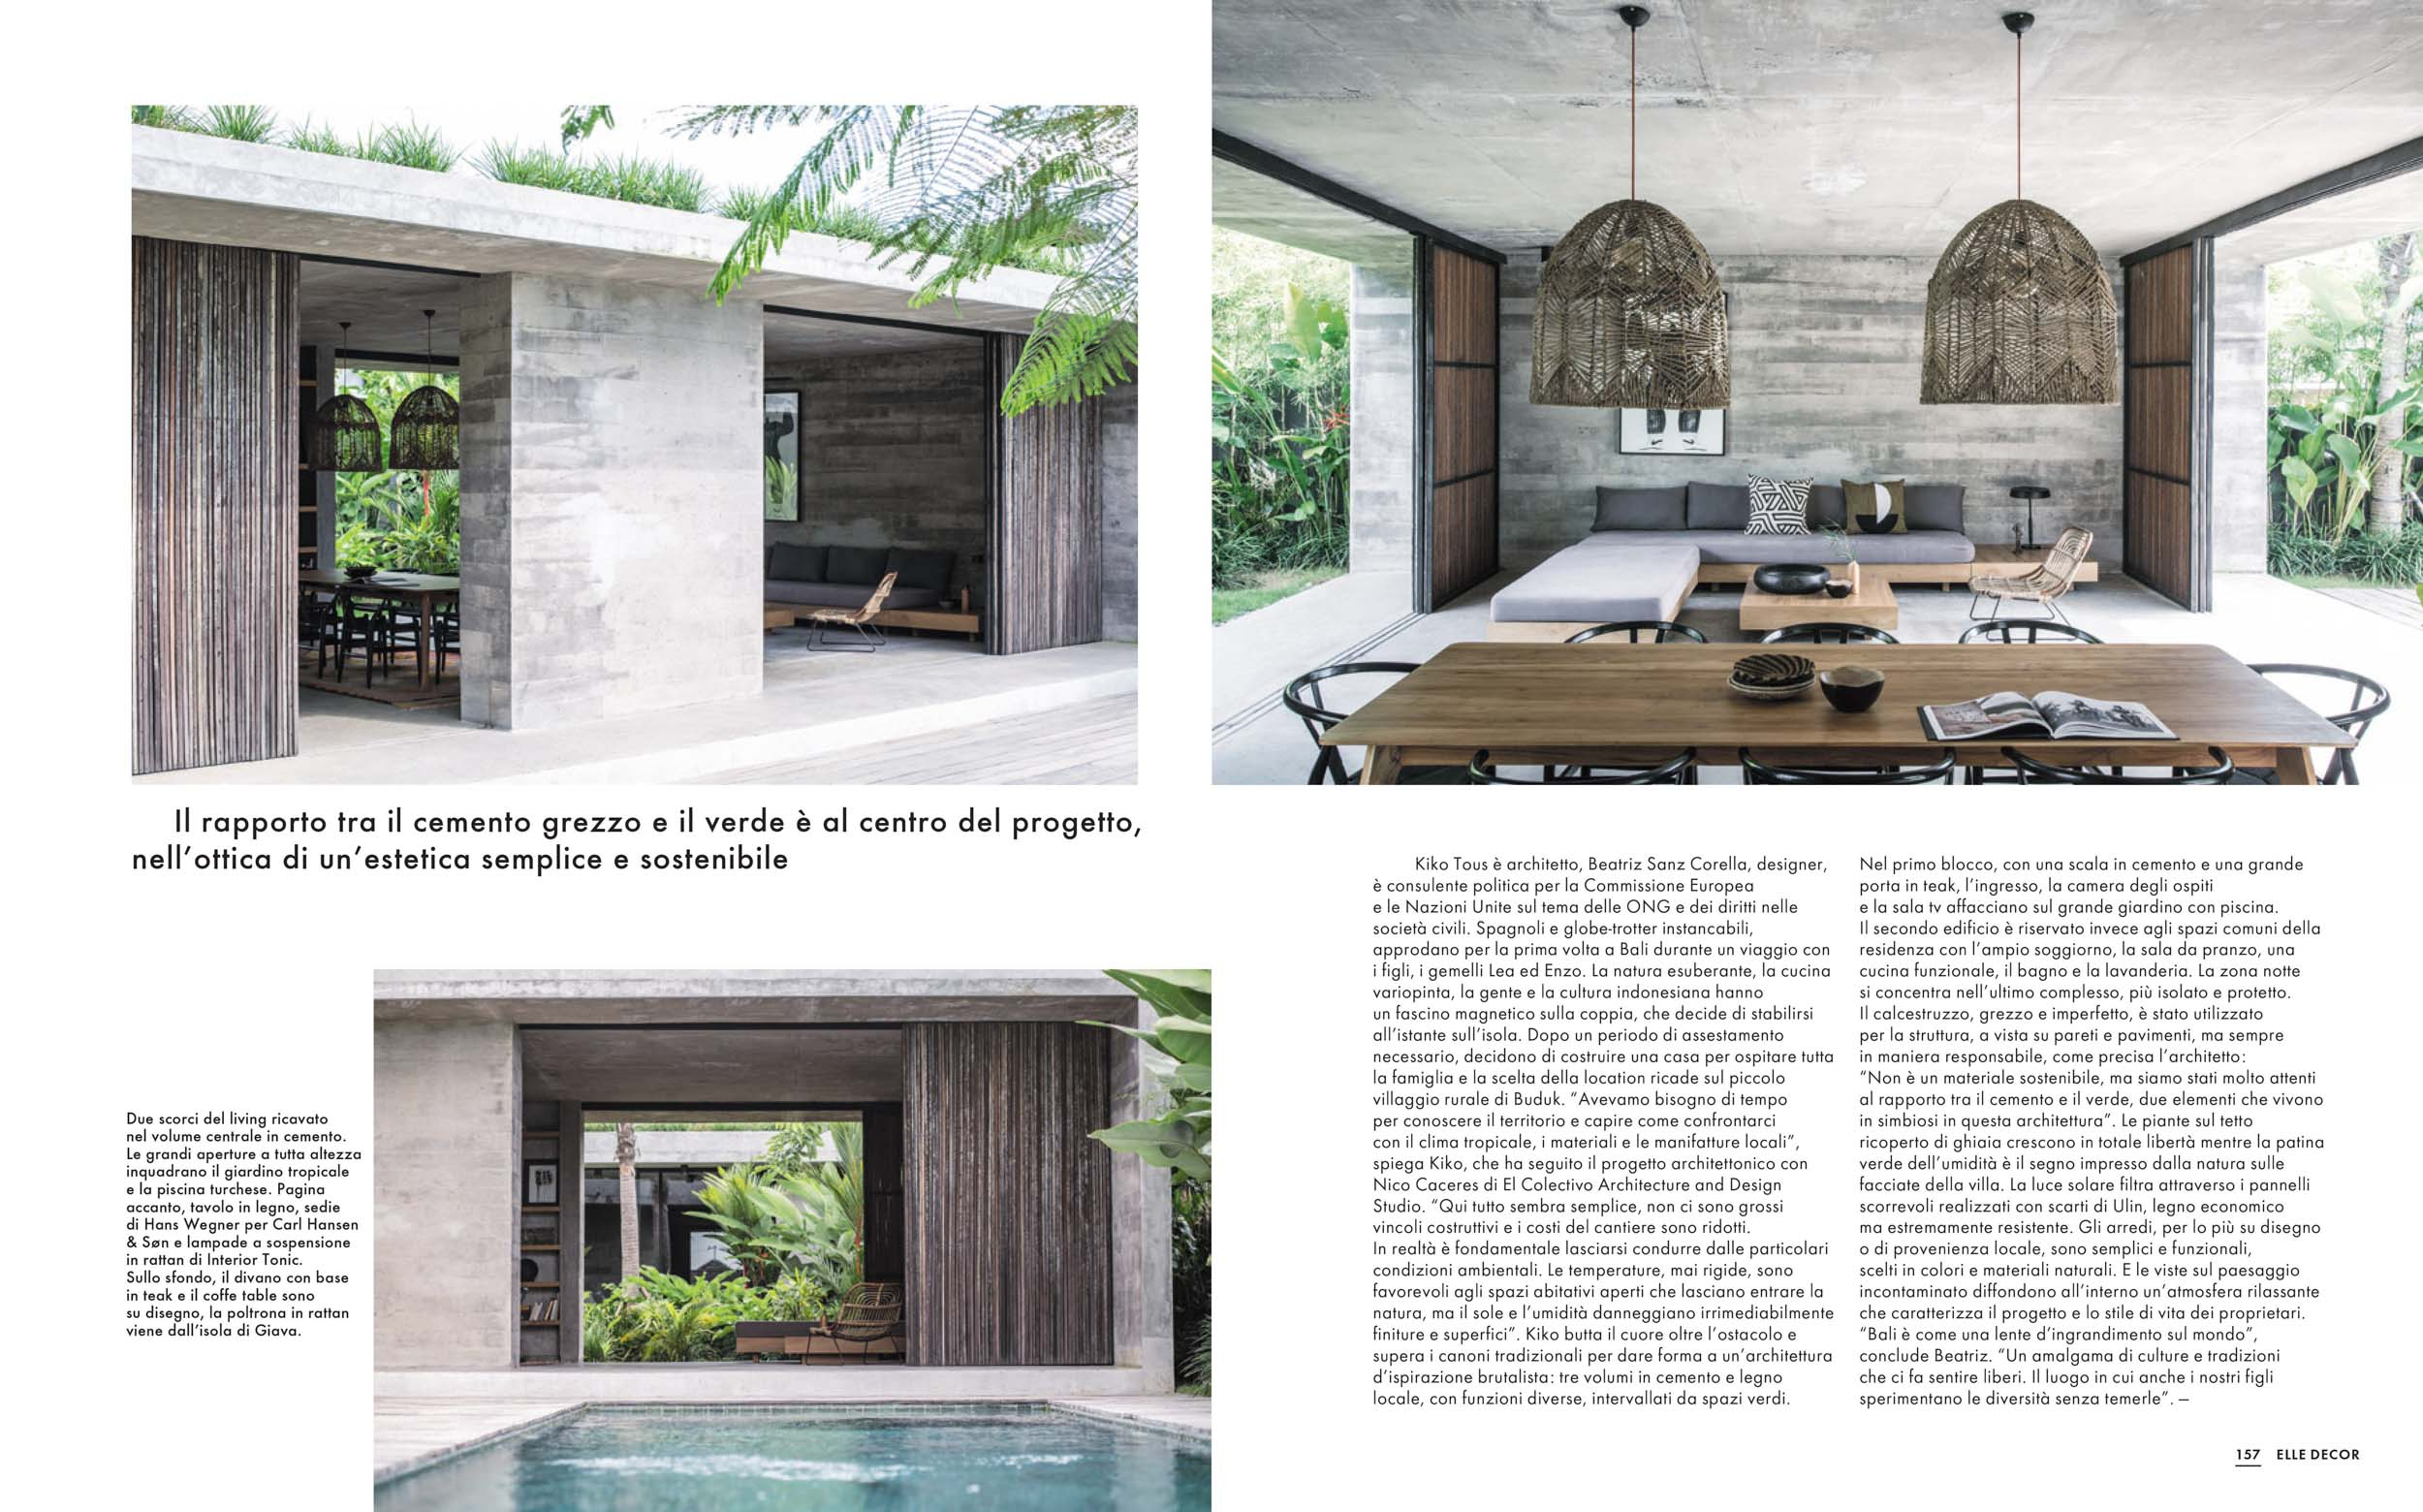 Elle-Decor-Italia-Tommaso-riva-tami-christiansen-francesca-benedetto-bali-interiors-brutalism (3 of 5).jpg